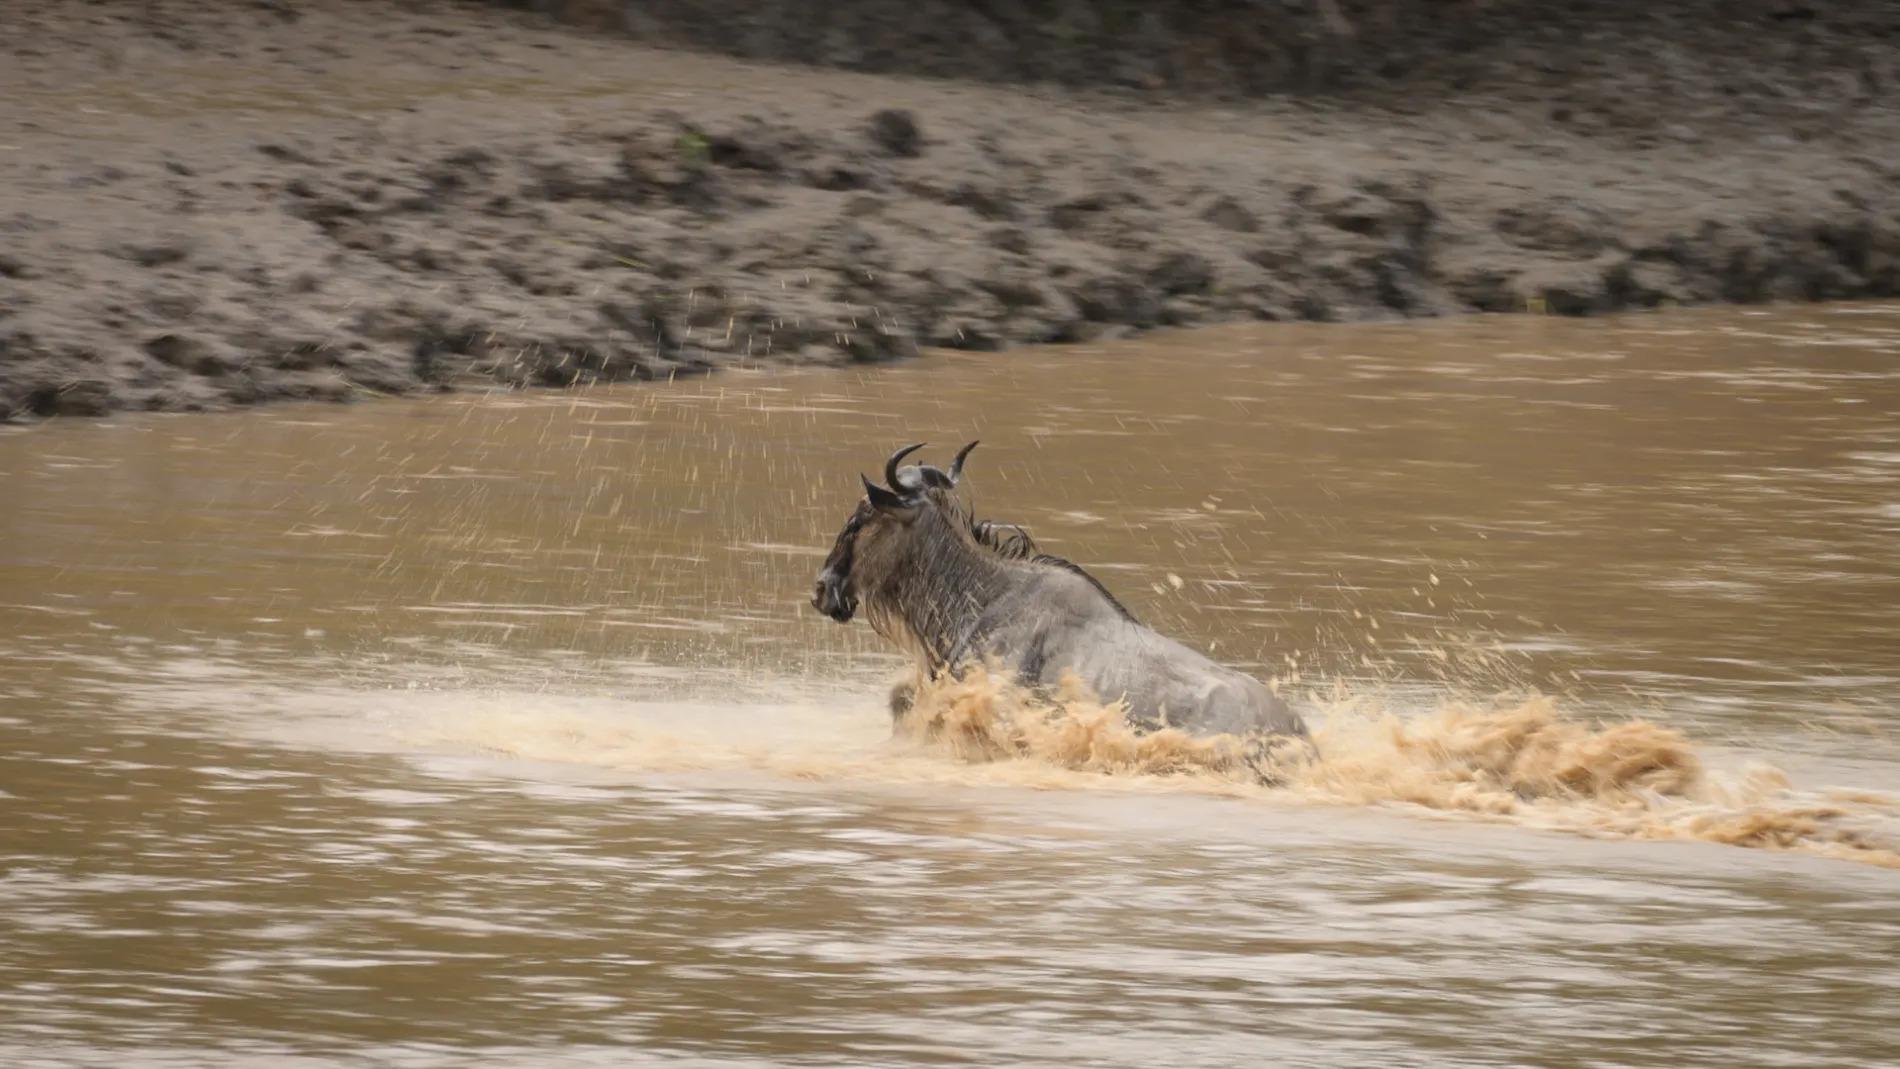 Lone wildebeest crossing river